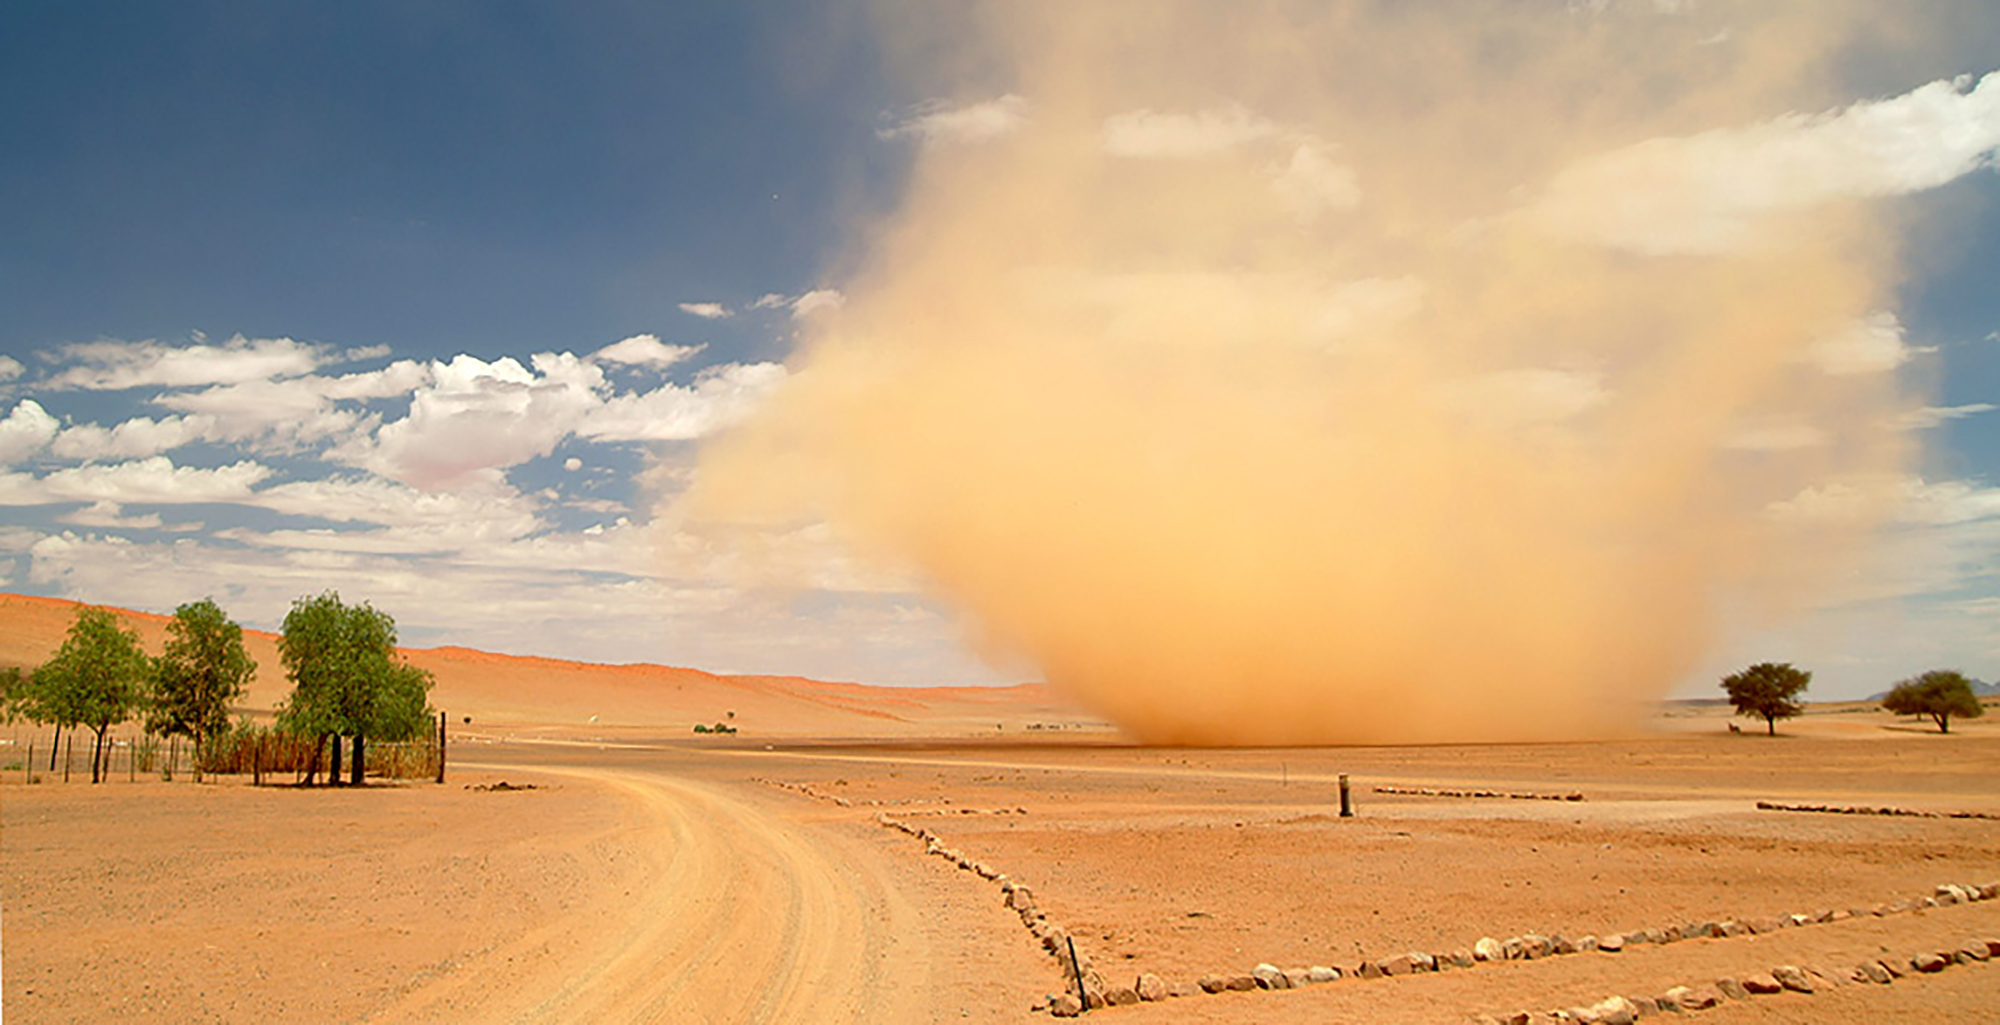 Namibia-NamibRand-Reserve-Dust-Devil